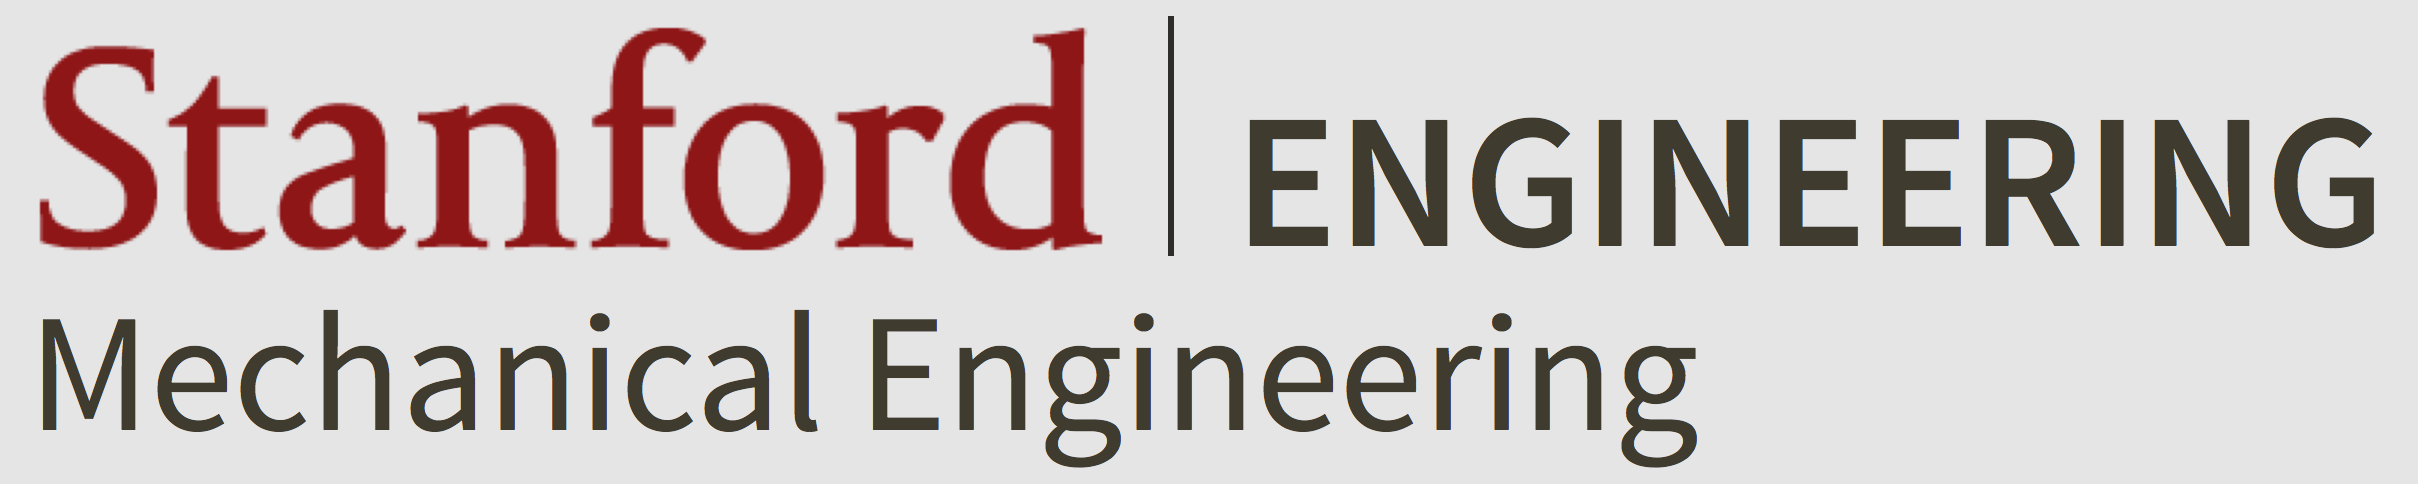 Mechanical engineer cdr